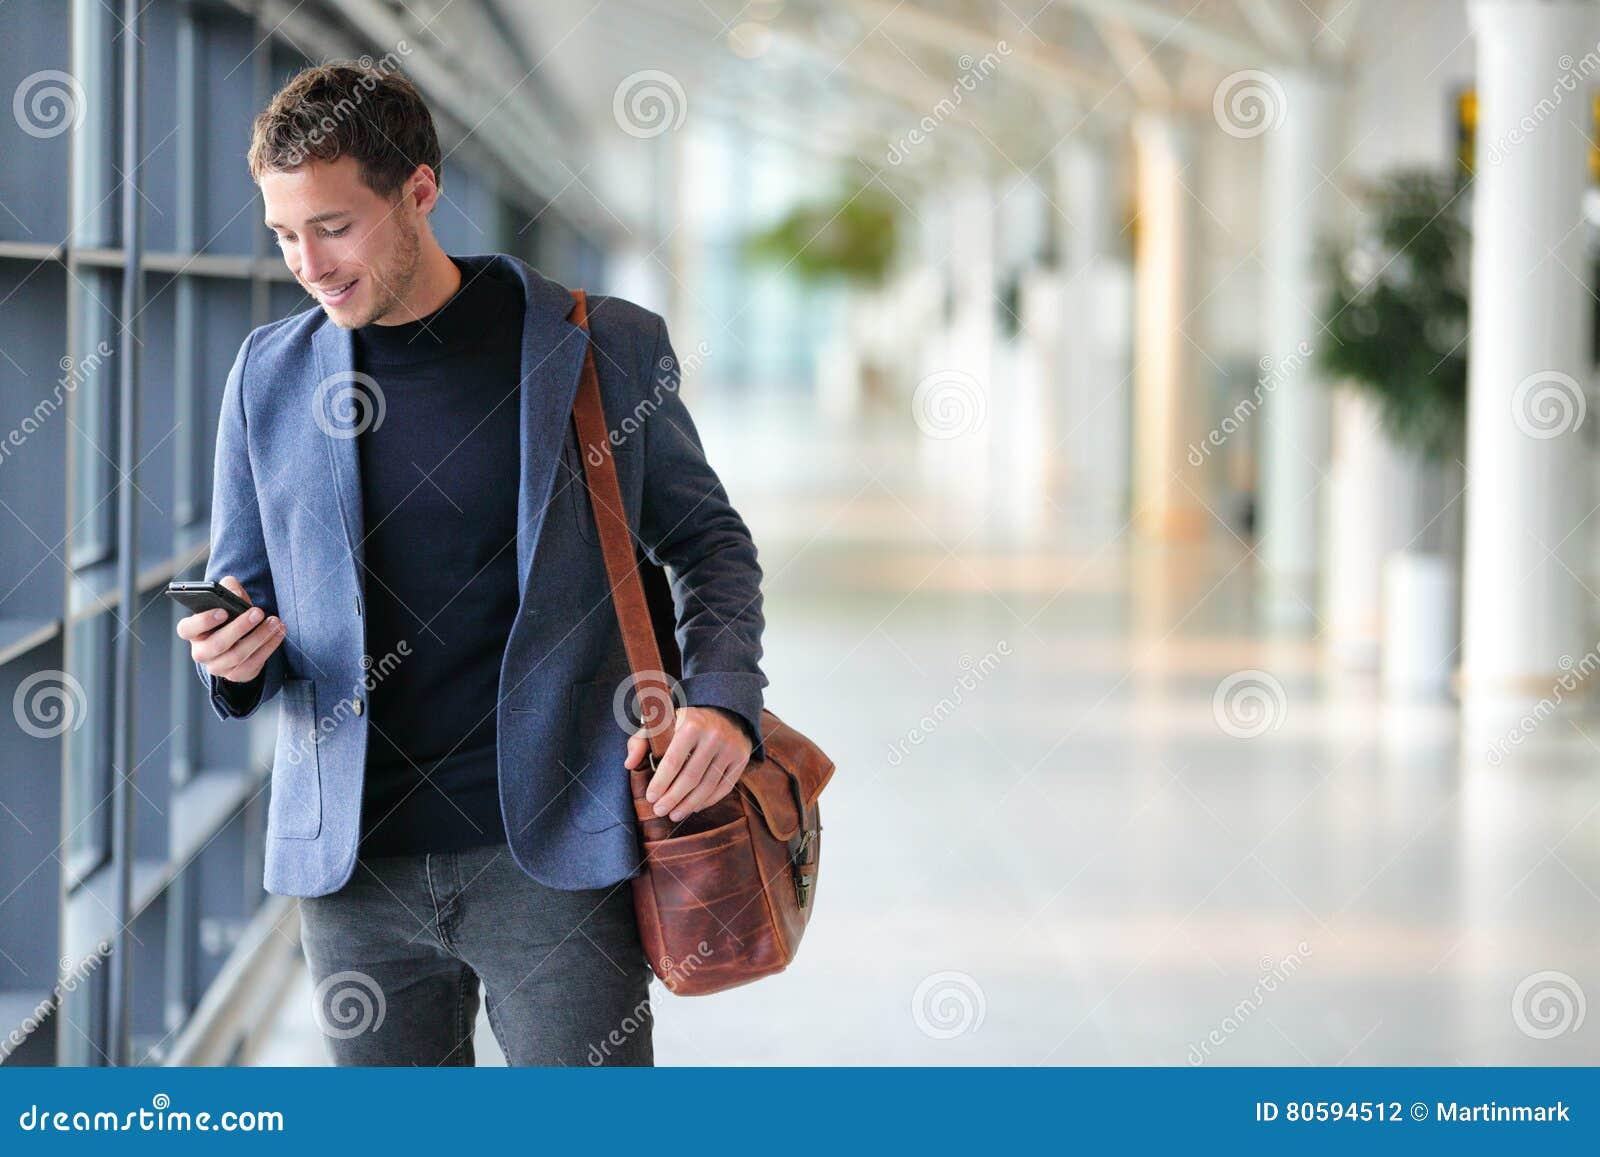 Business man using mobile phone app in airport